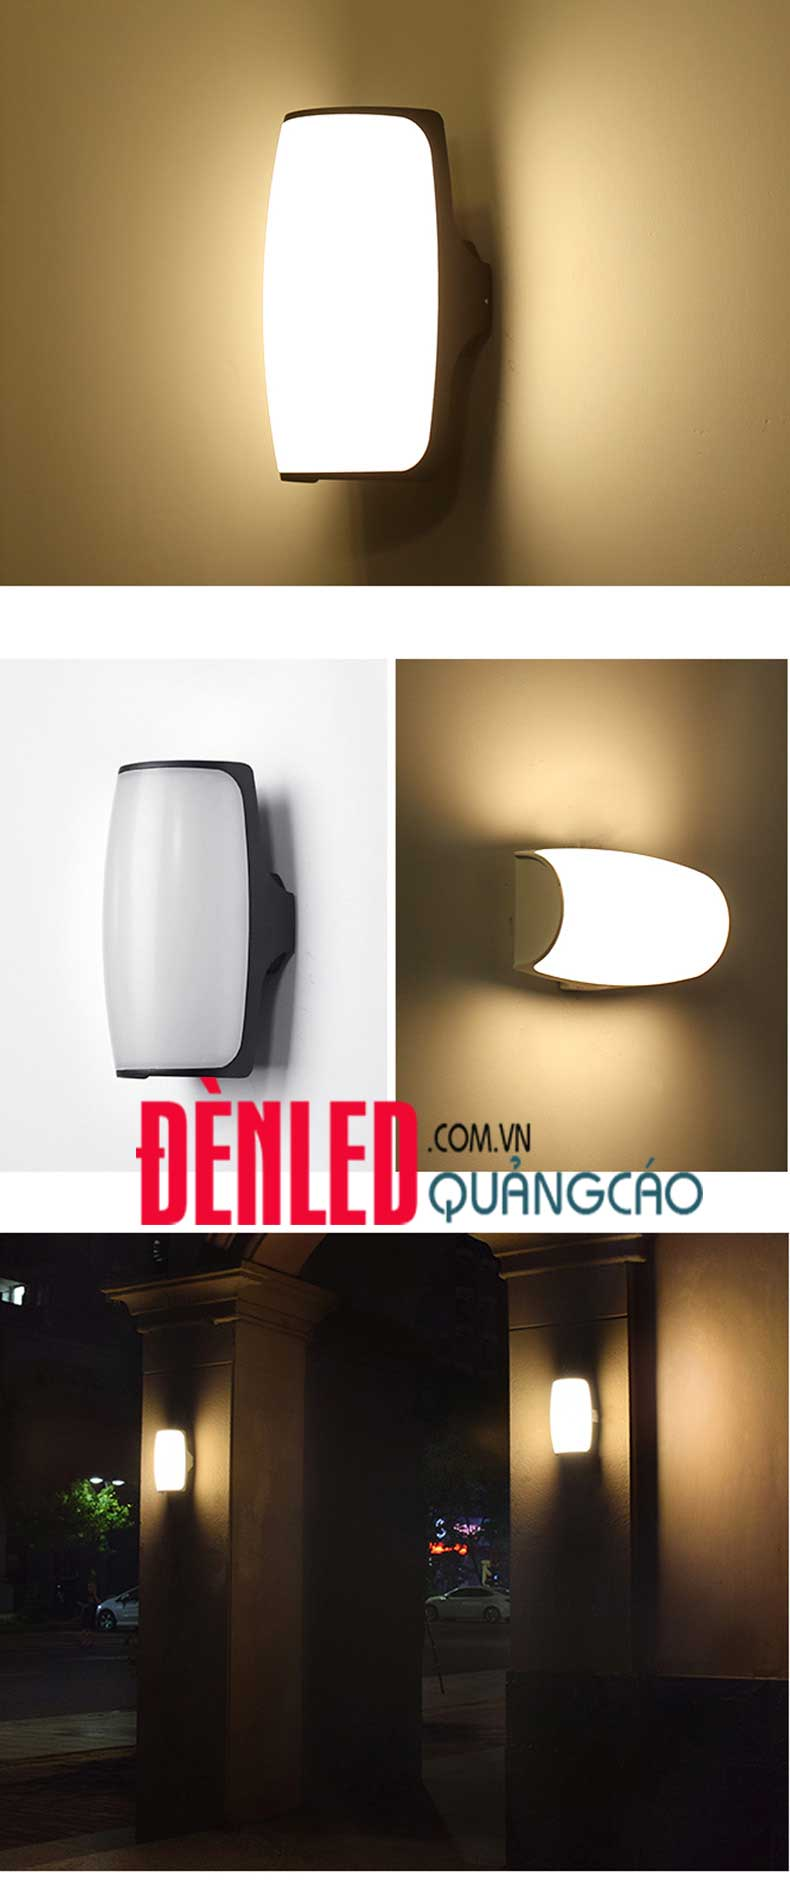 den-treo-tuong-led-hien-dai-12w-ngoai-troi-tl-dht-604-light